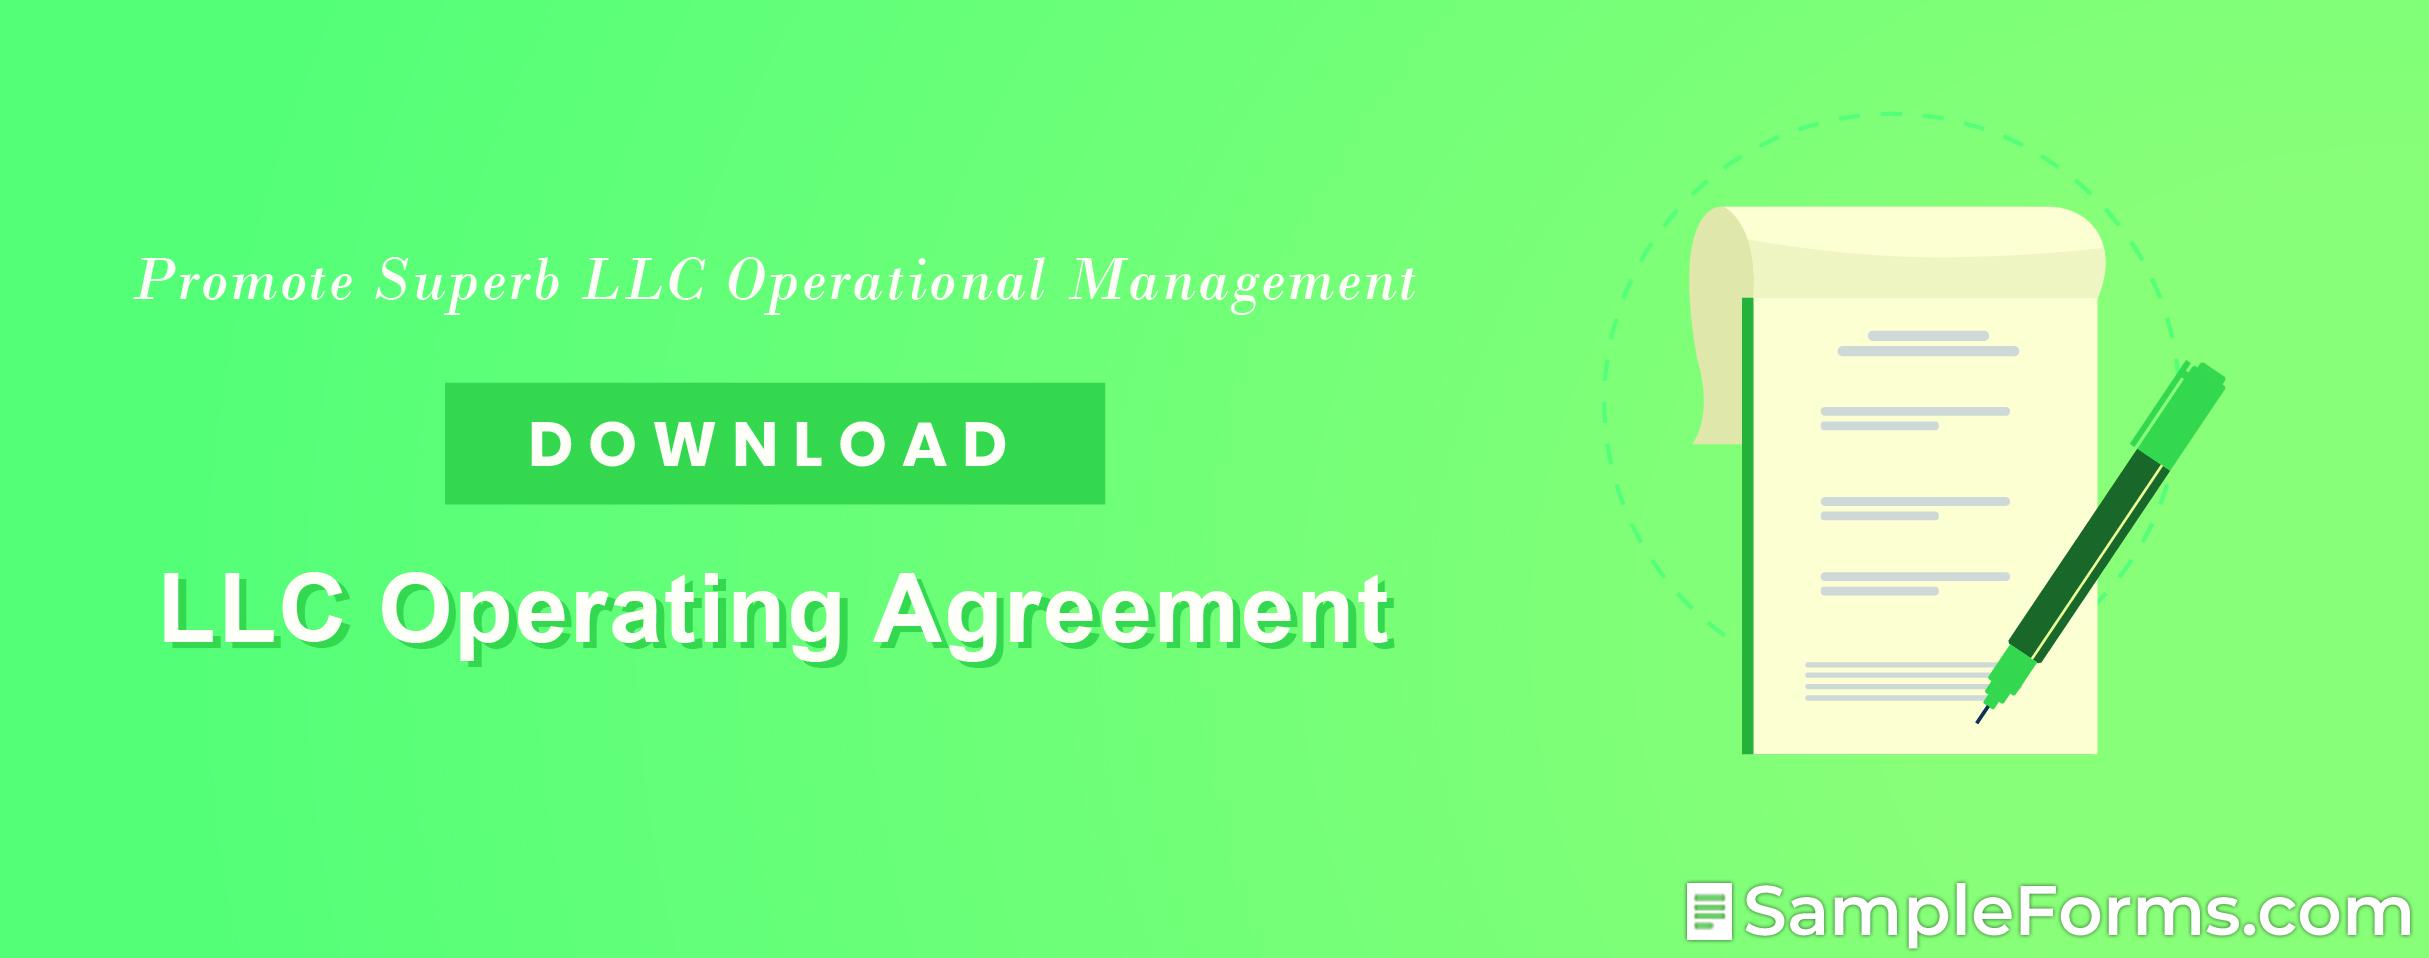 LLC Operating Agreement2